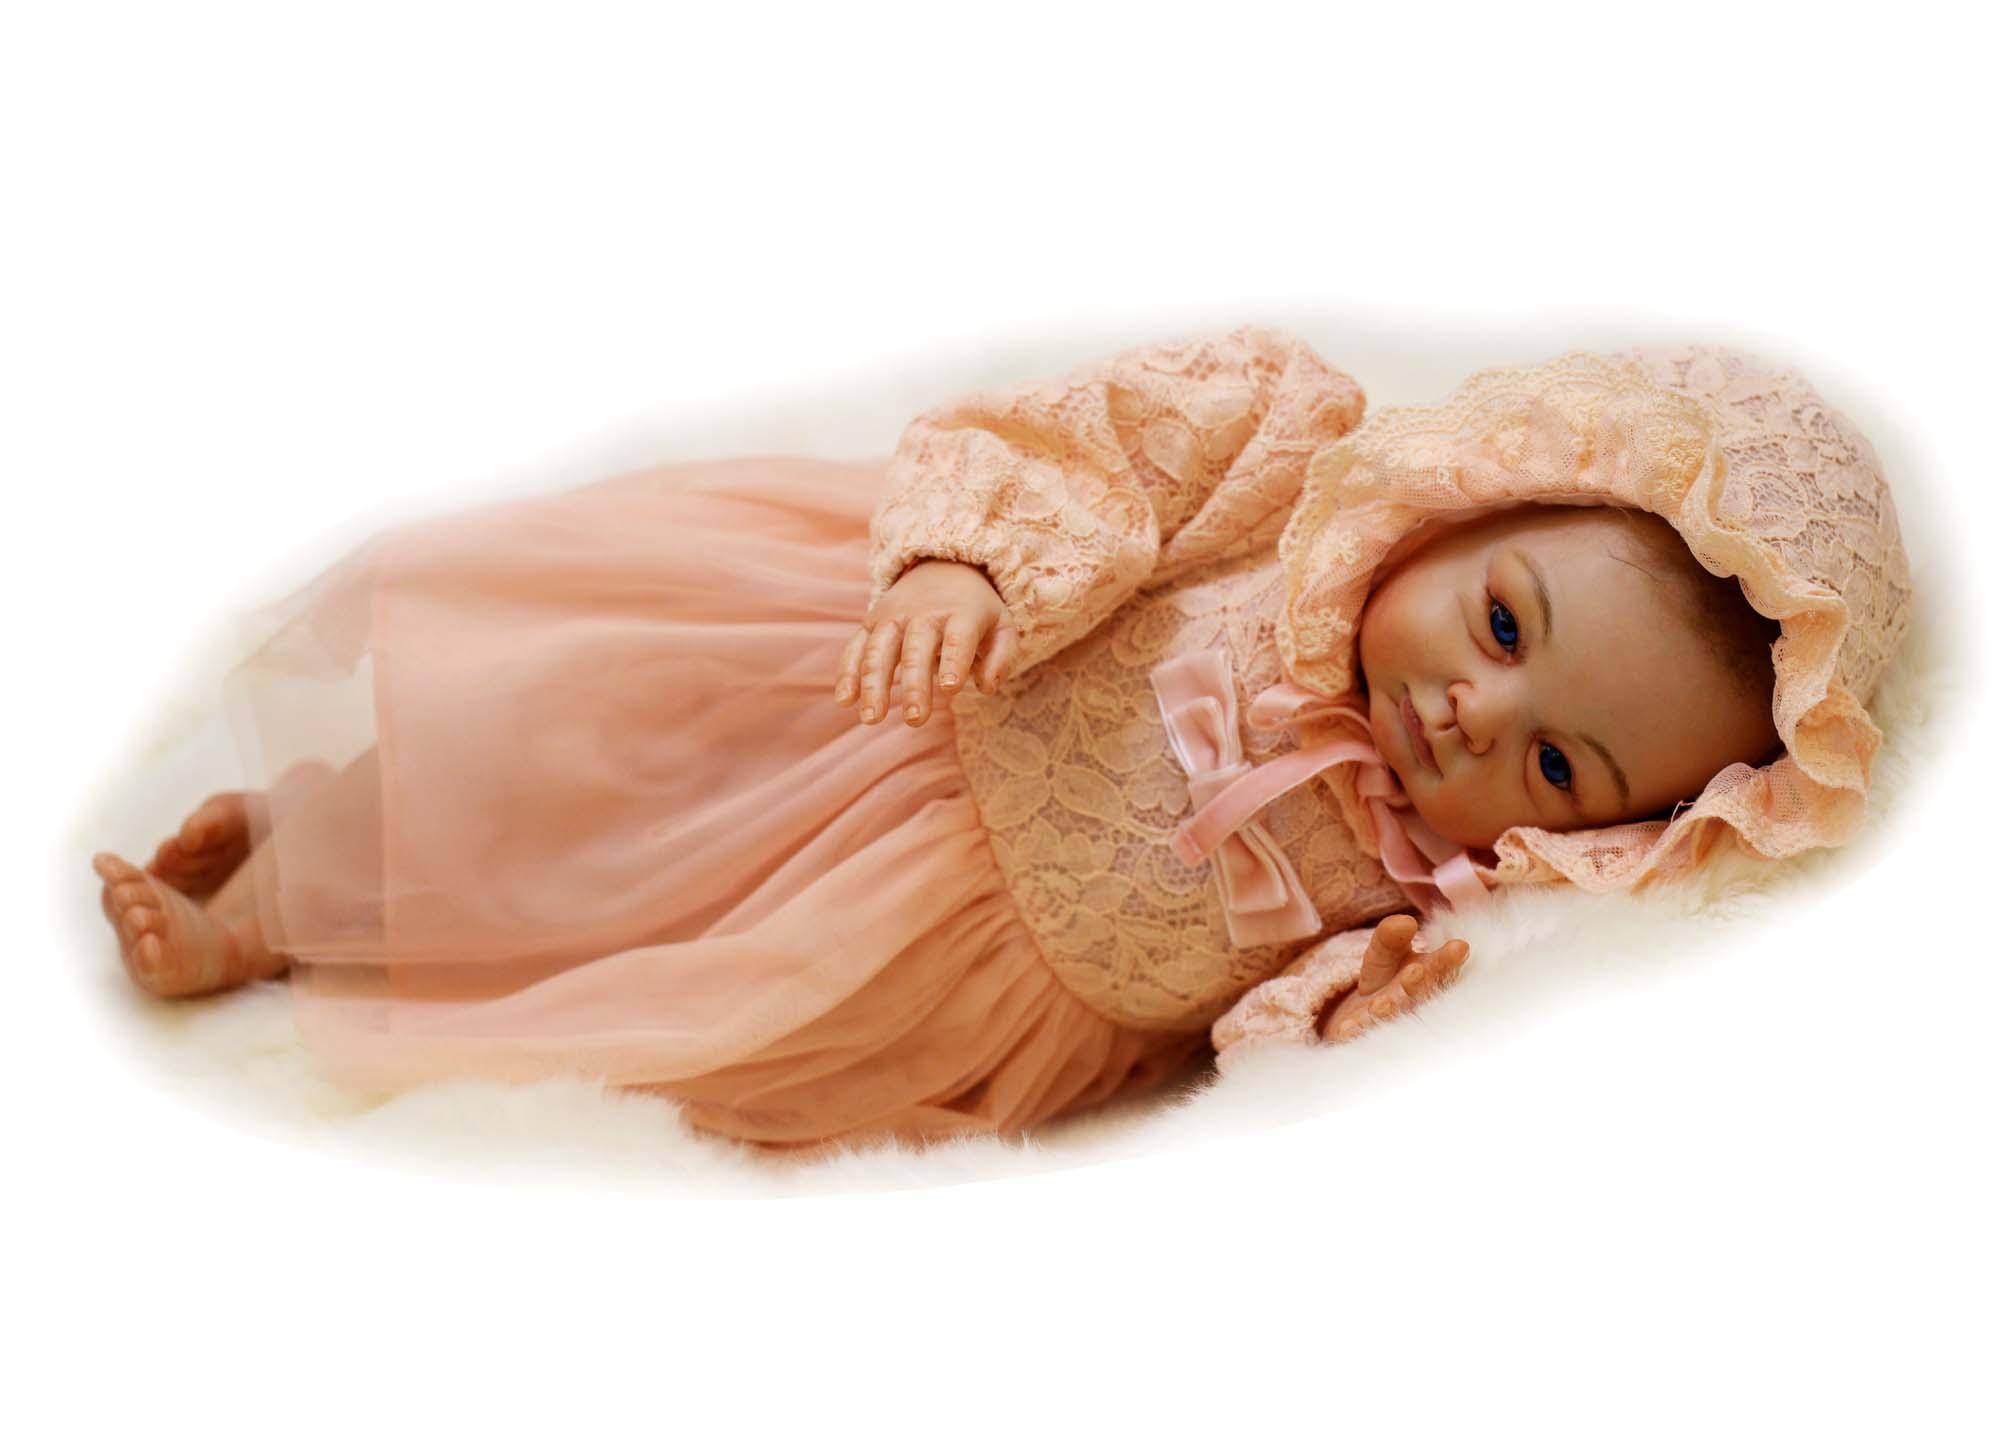 54cm Hand Printed Baby Dolls Reborn Babe Doll Kid's Toys Soft Girl Princess Brinquedos Nurse Education Doll Christmas Gifts(China (Mainland))